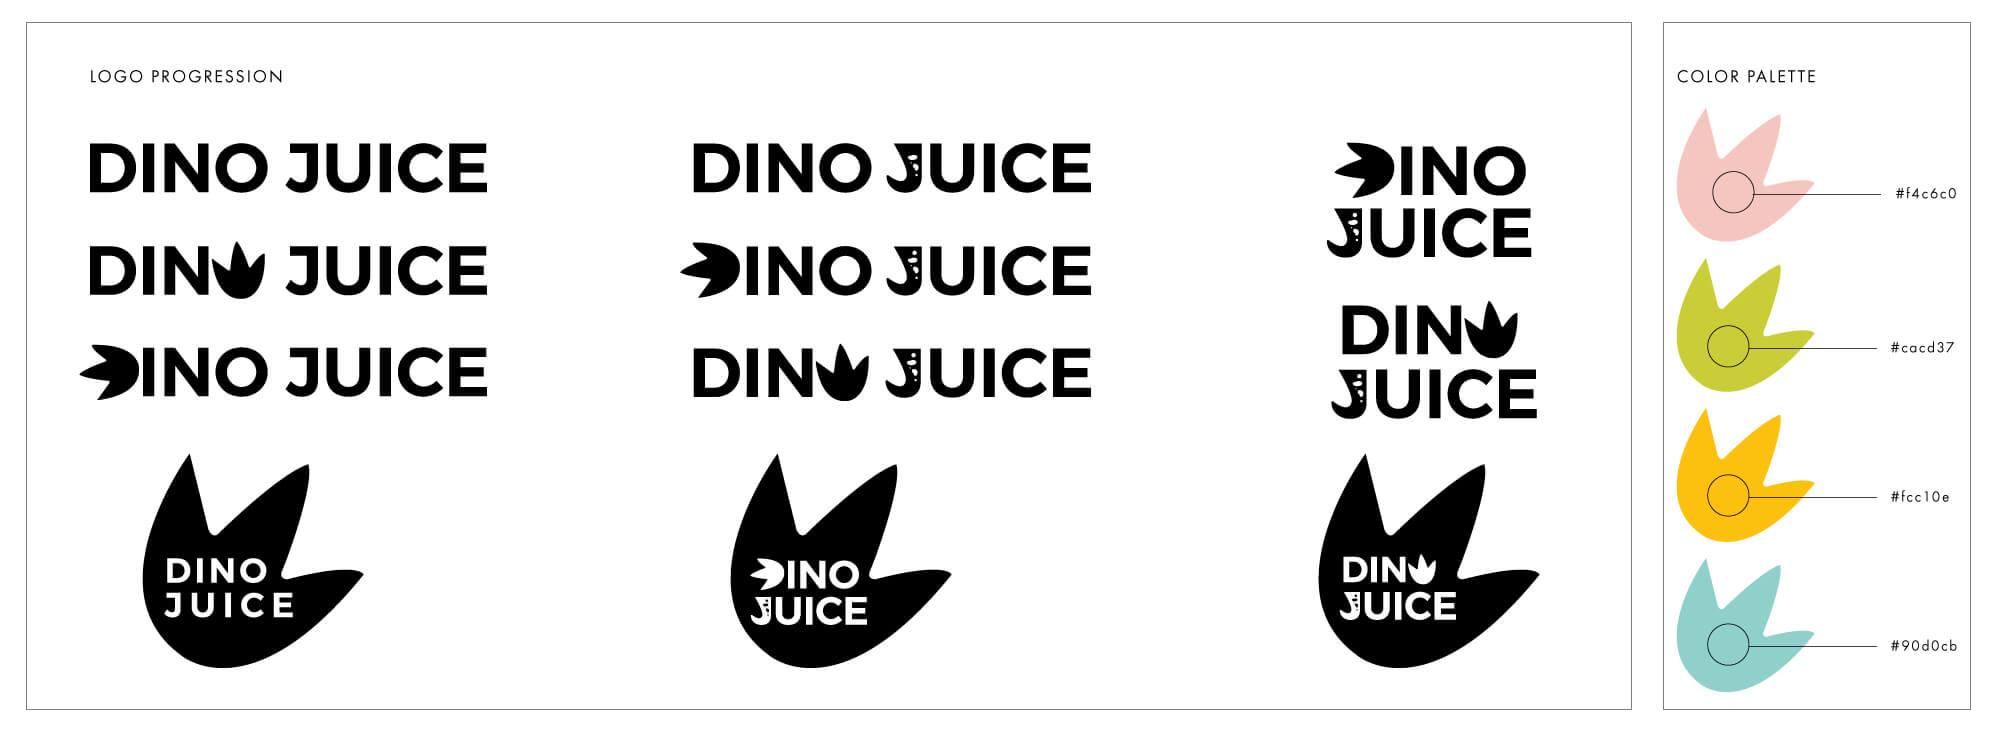 DinoJuice_LogoProgression_FULL.jpg